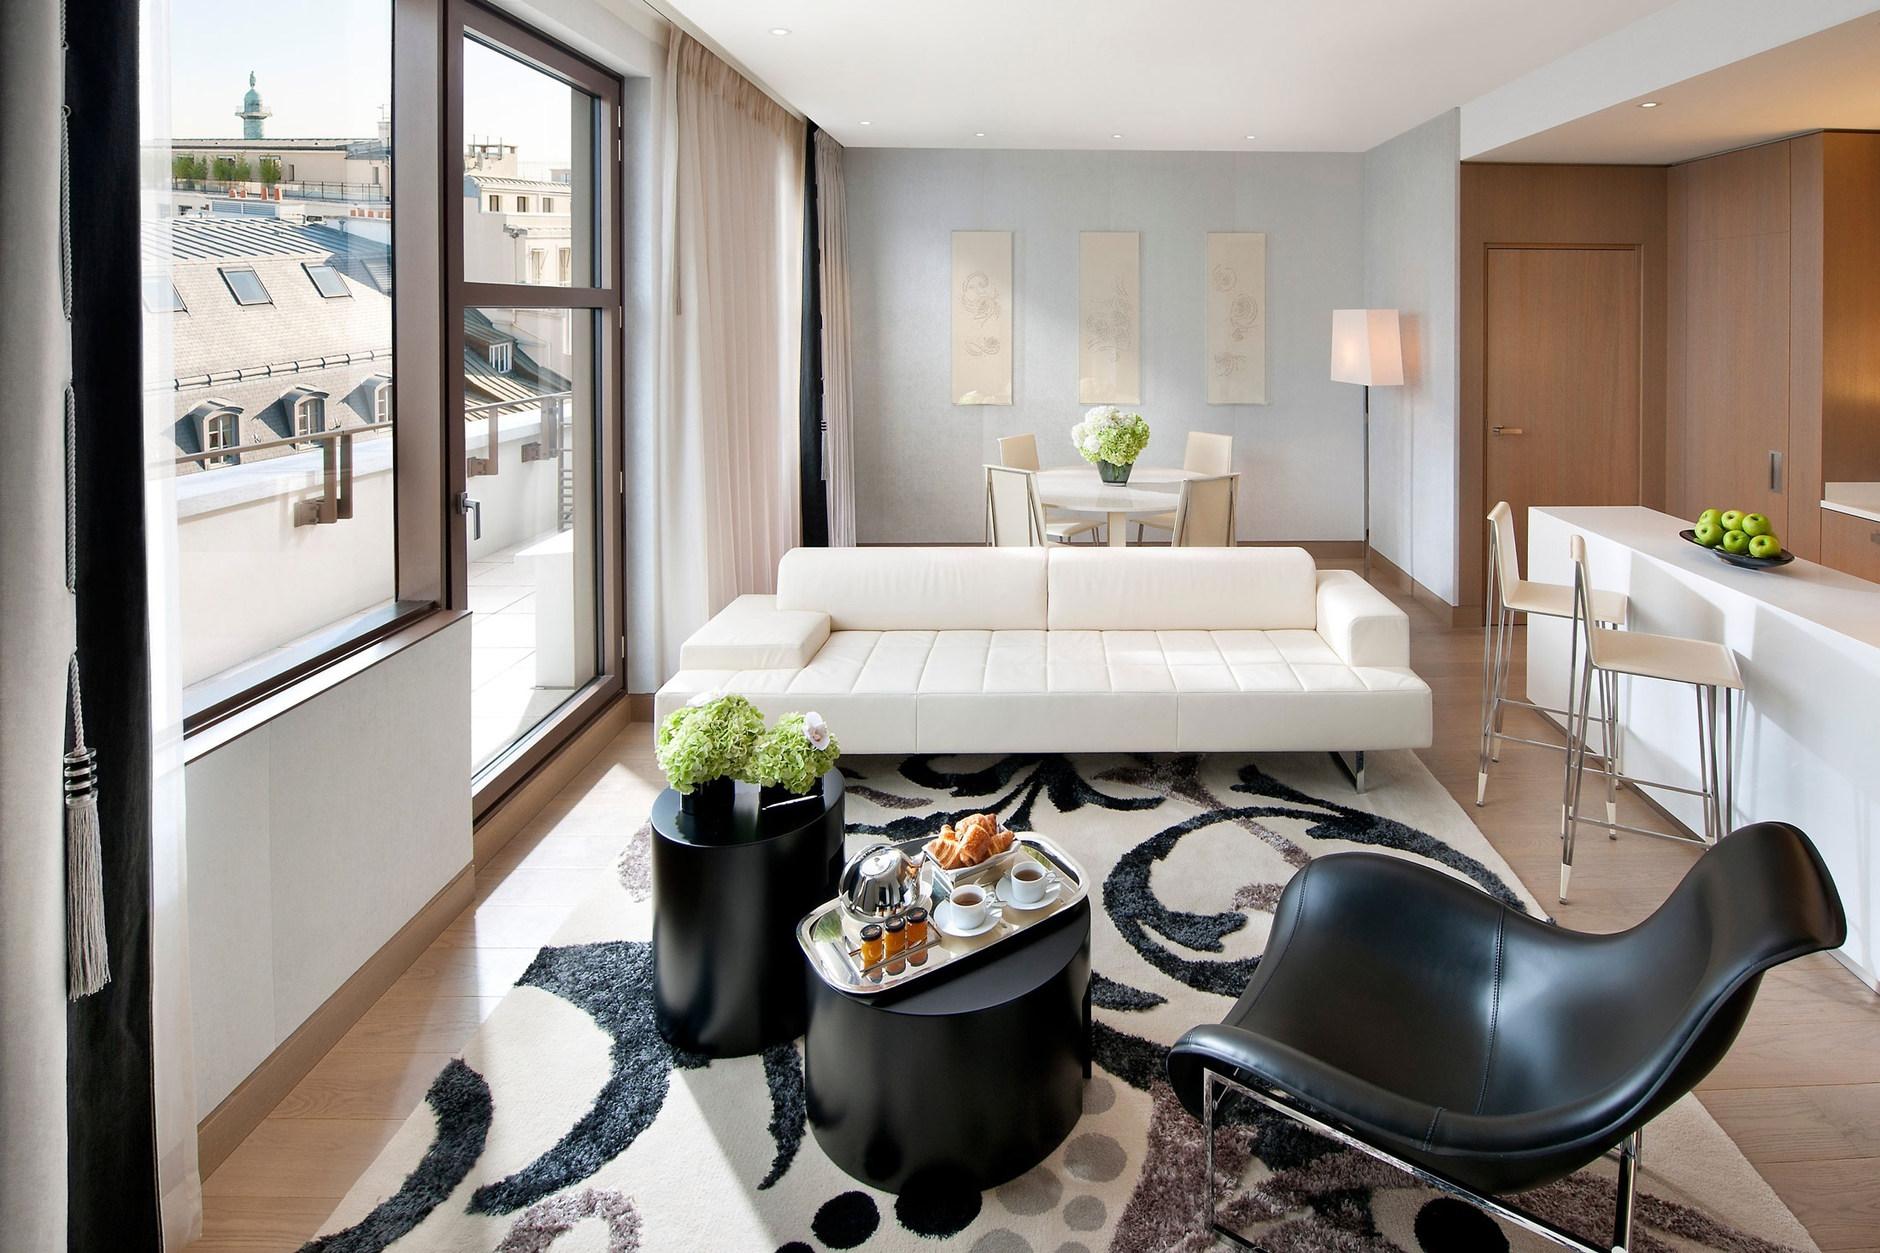 mandarin oriental paris by wilmotte associ s s a karmatrendz. Black Bedroom Furniture Sets. Home Design Ideas